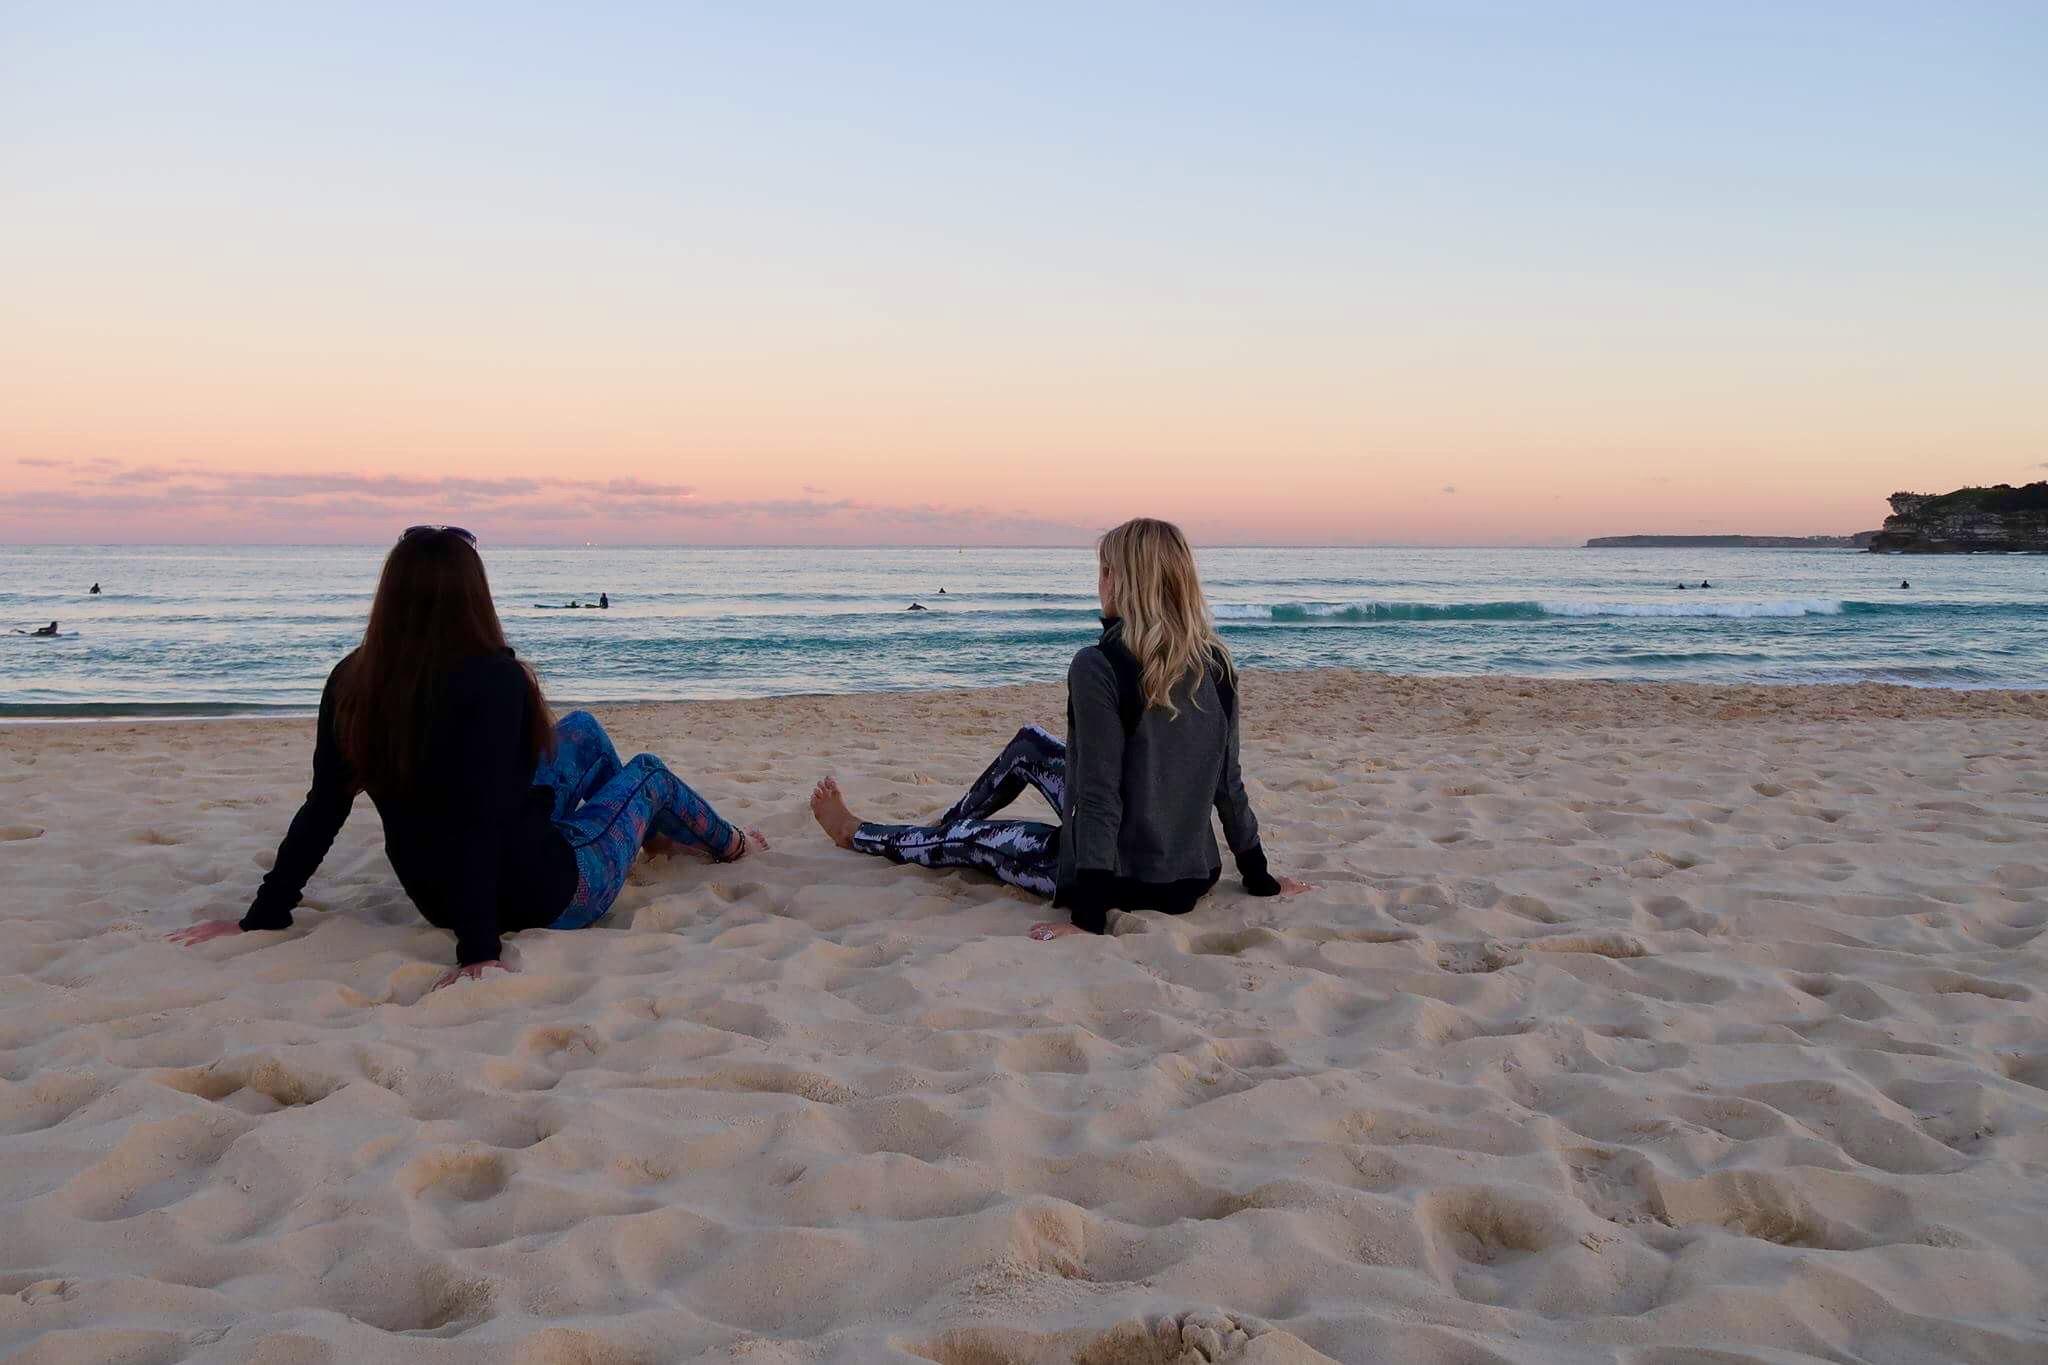 Winters sunset, Bondi Beach